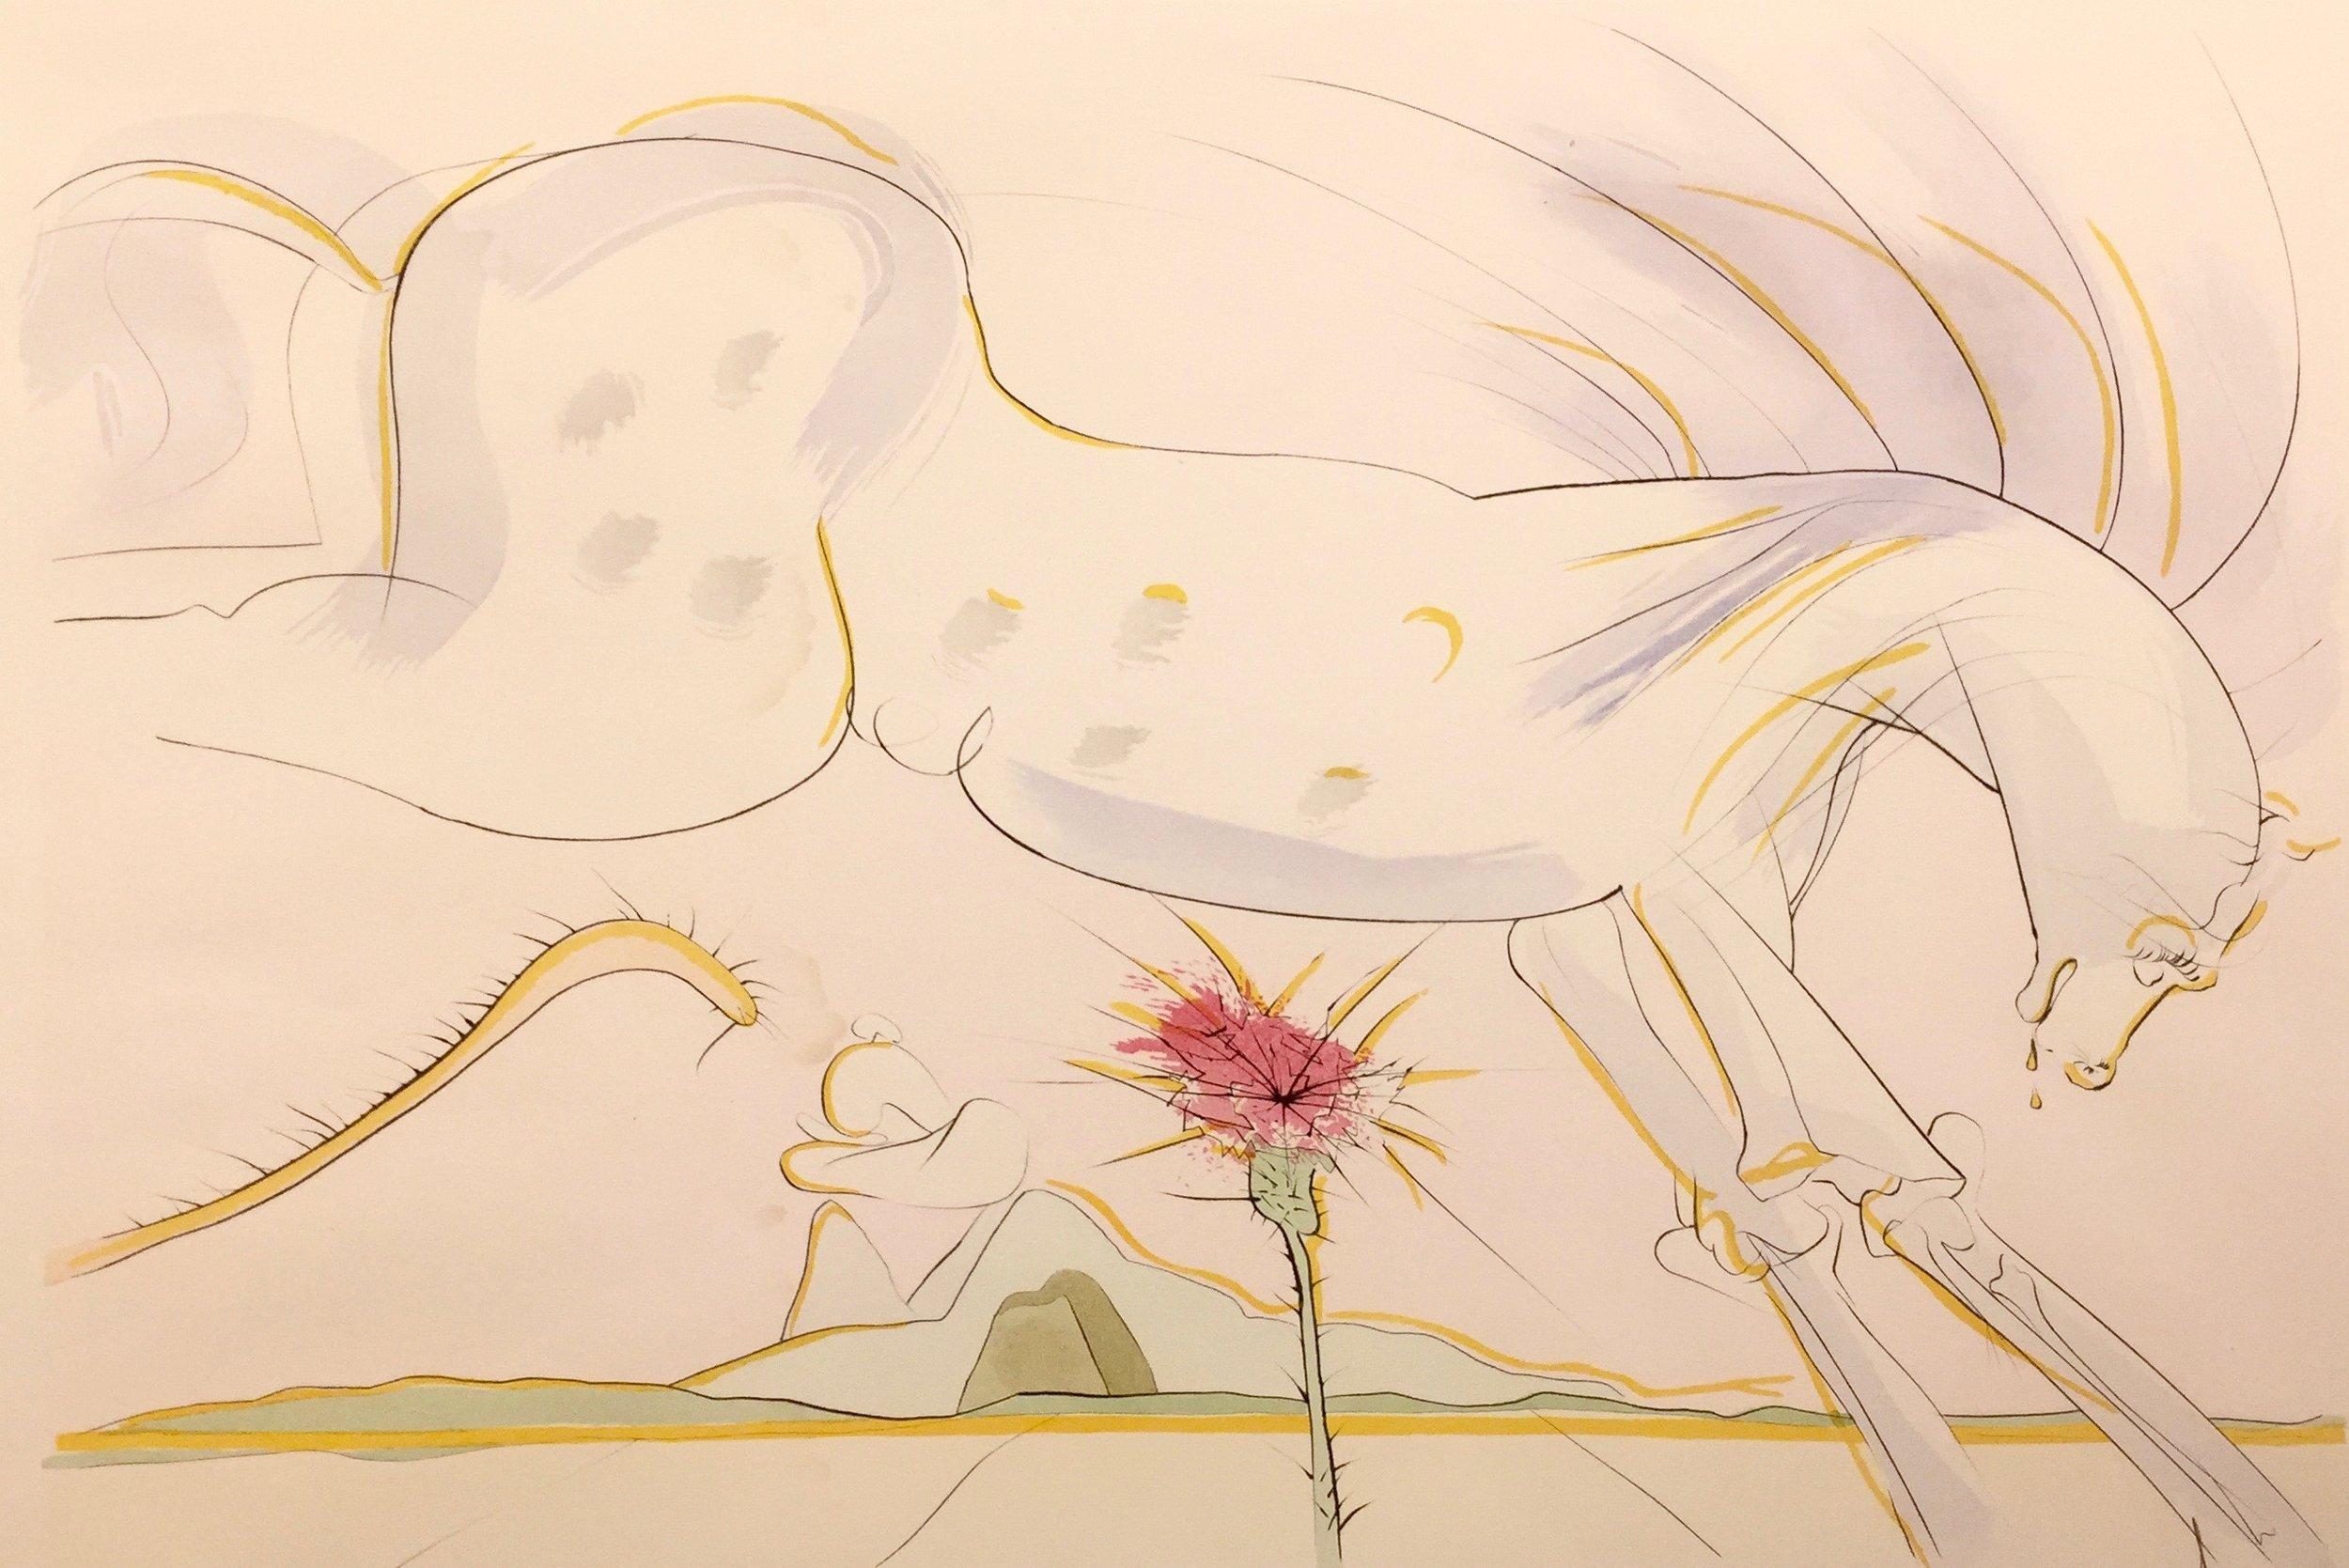 Le-Cheval-et-le-Loup-Salvador-Dali-AFA-Gallery-NYC.jpg